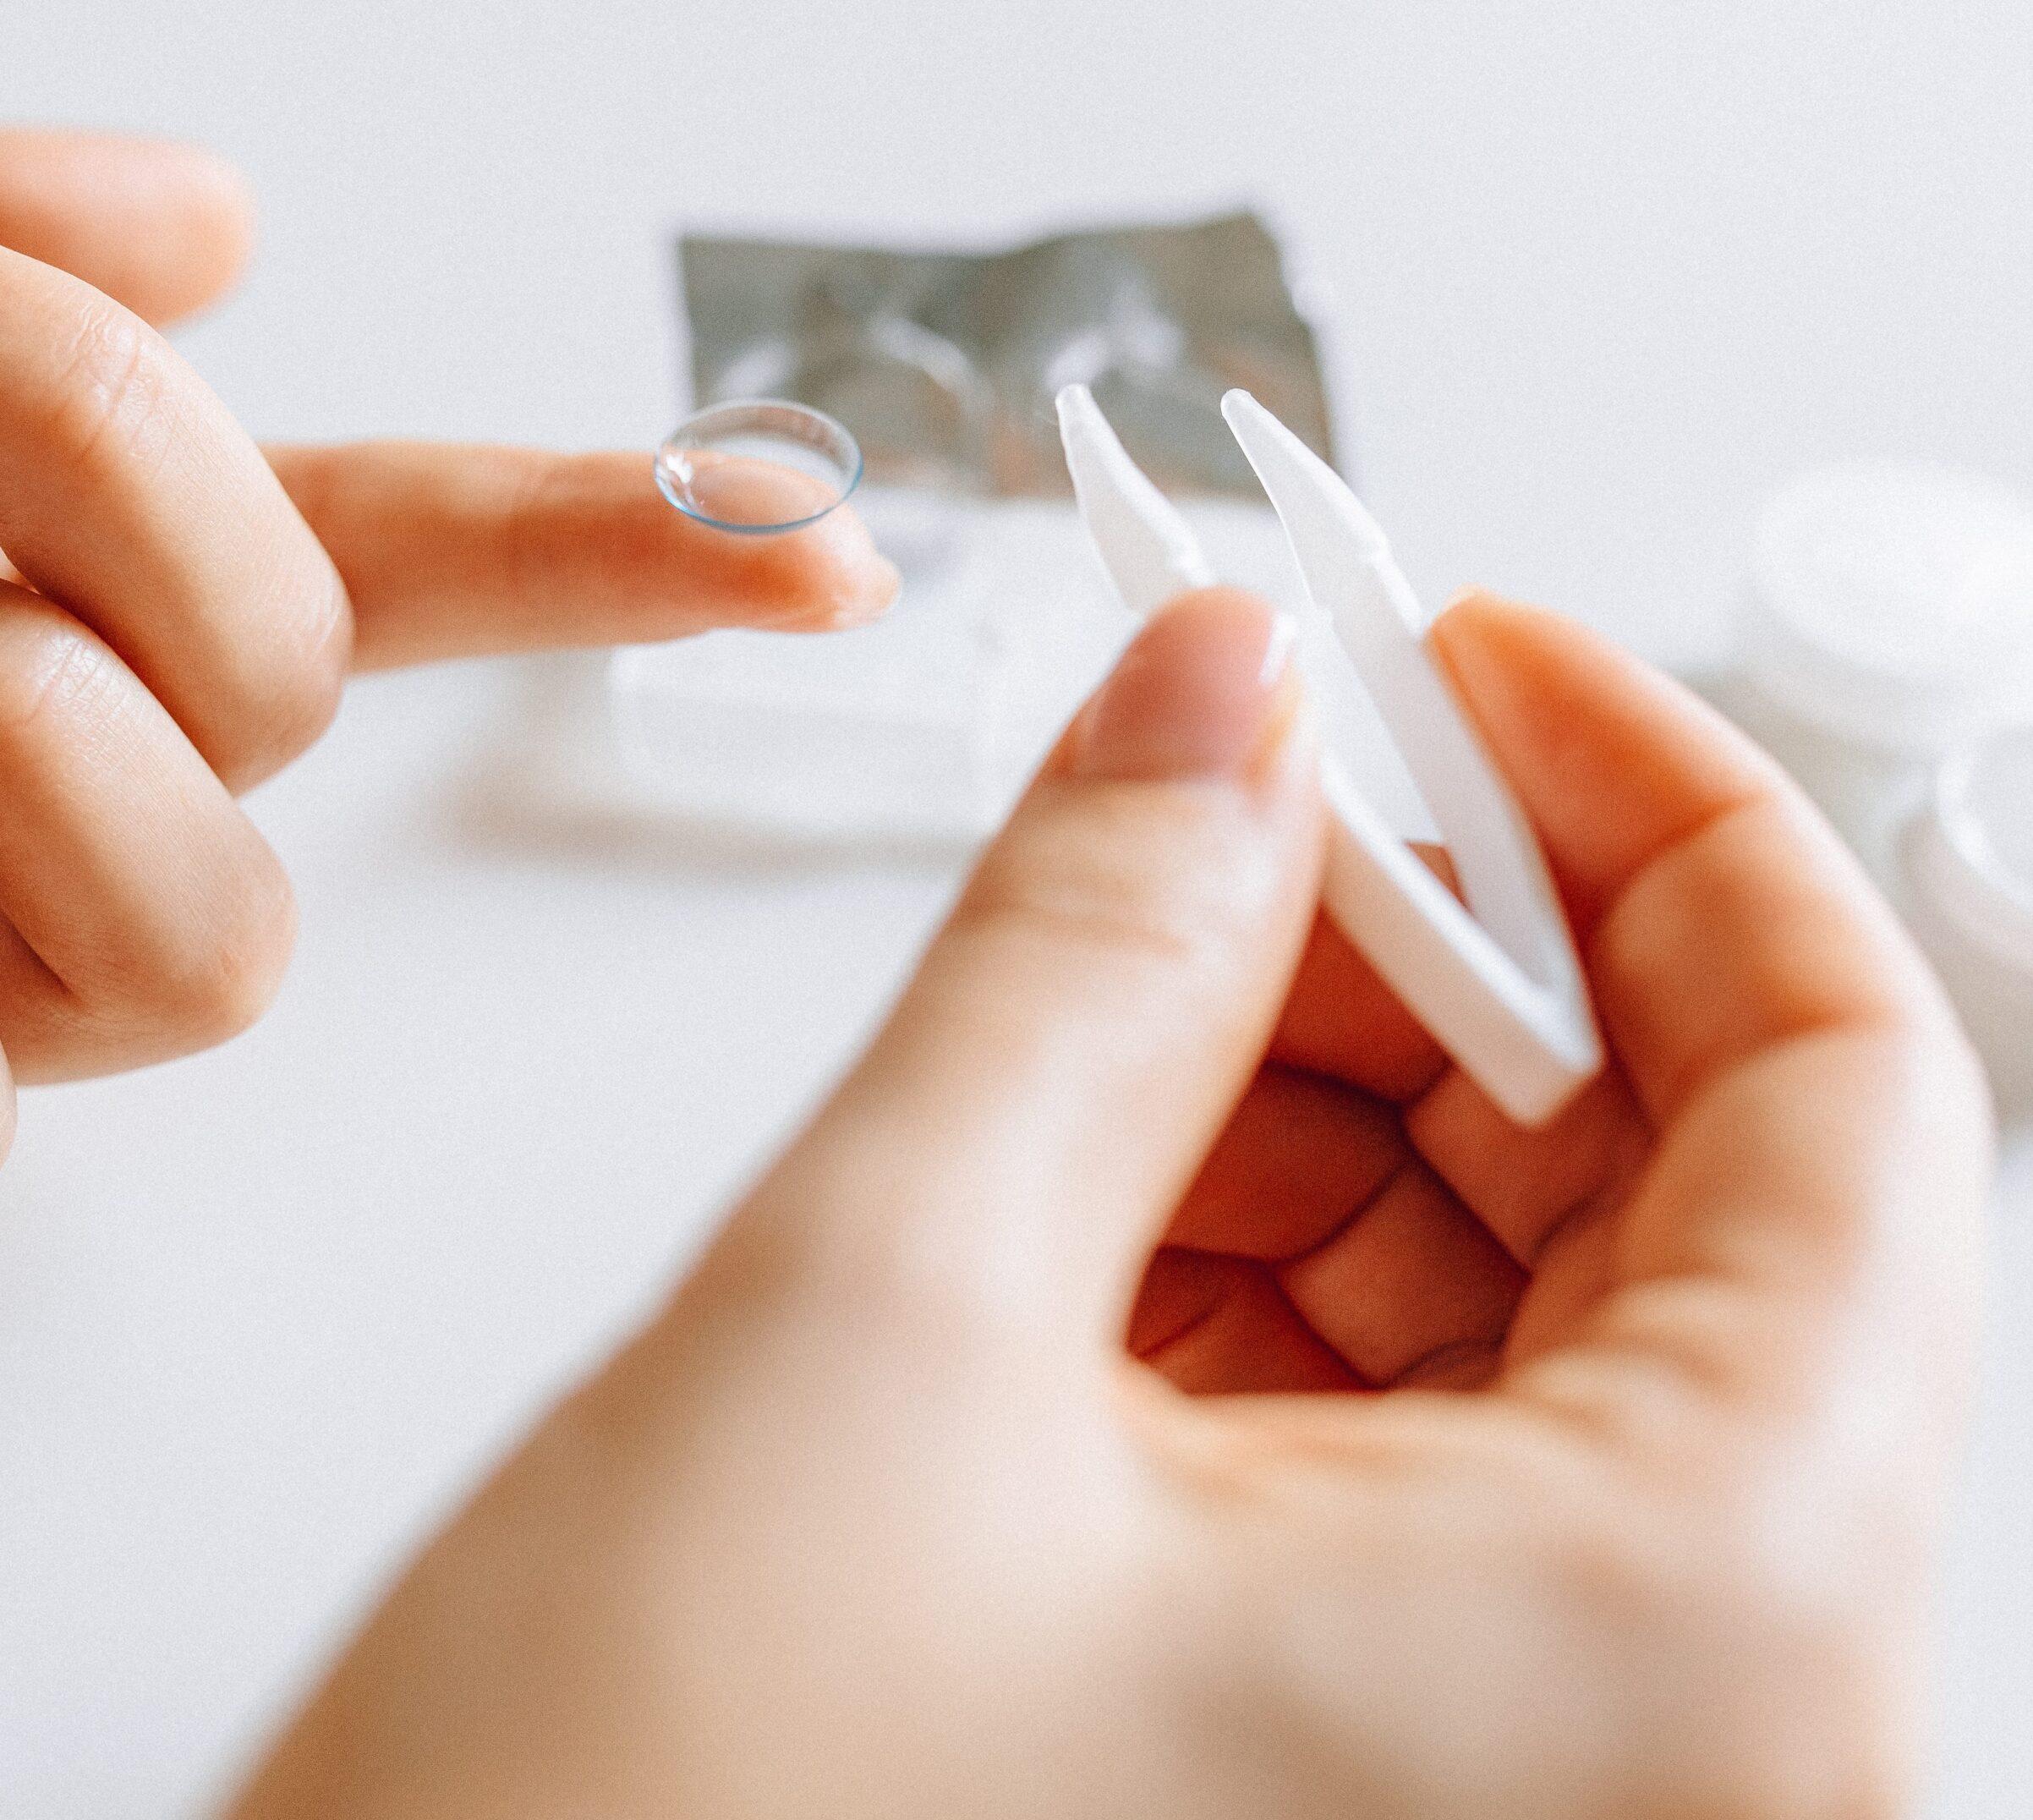 contact lens finger